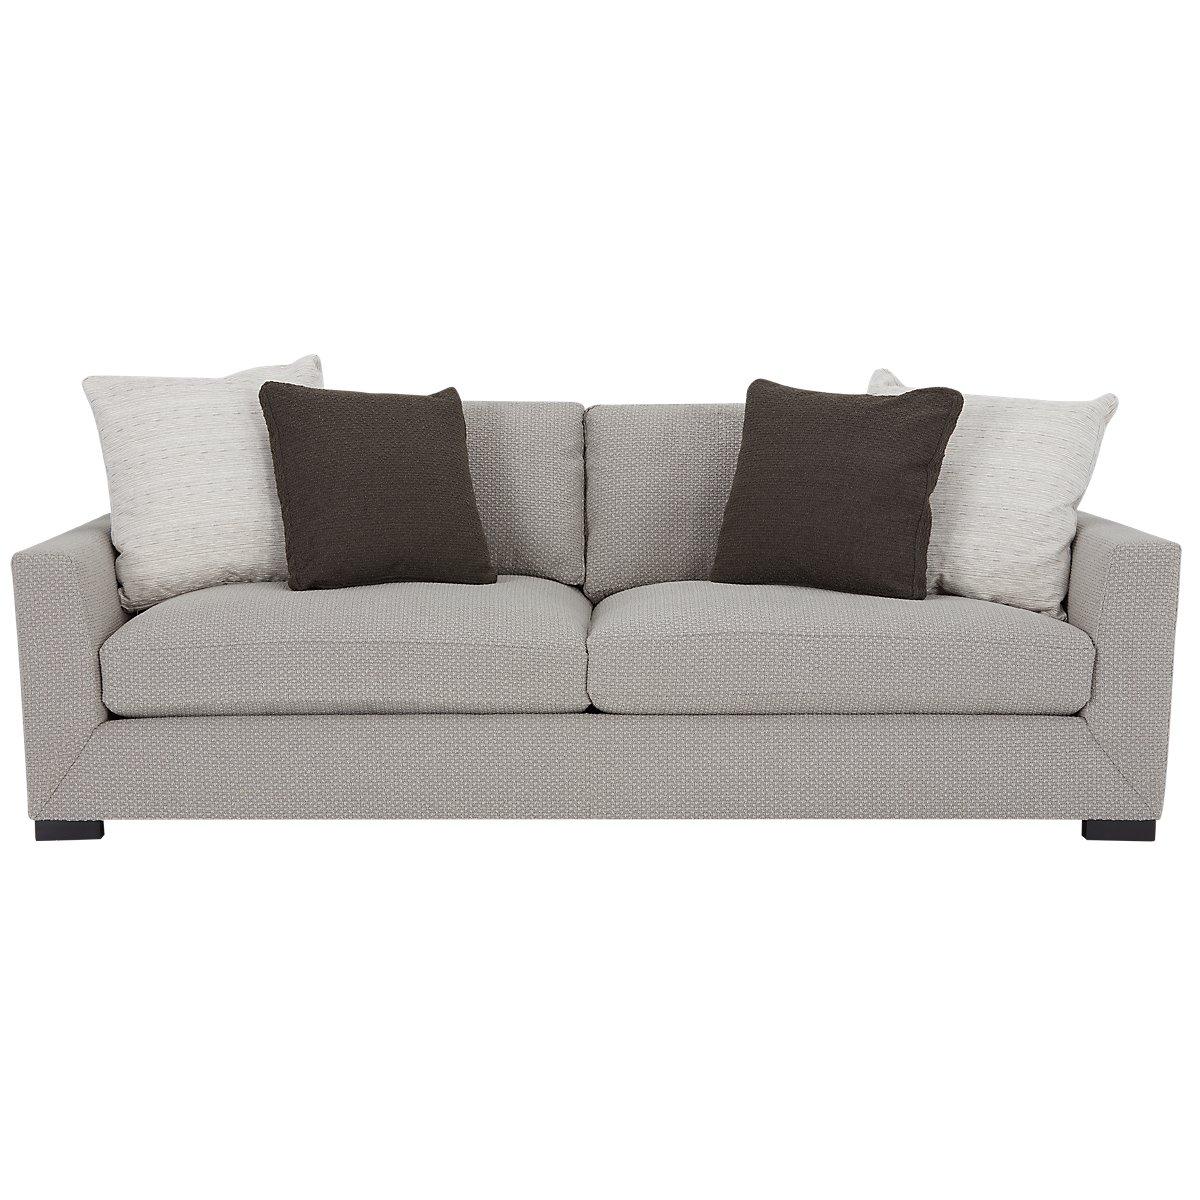 Light Gray Fabric Sofas Easy Home Decorating Ideas